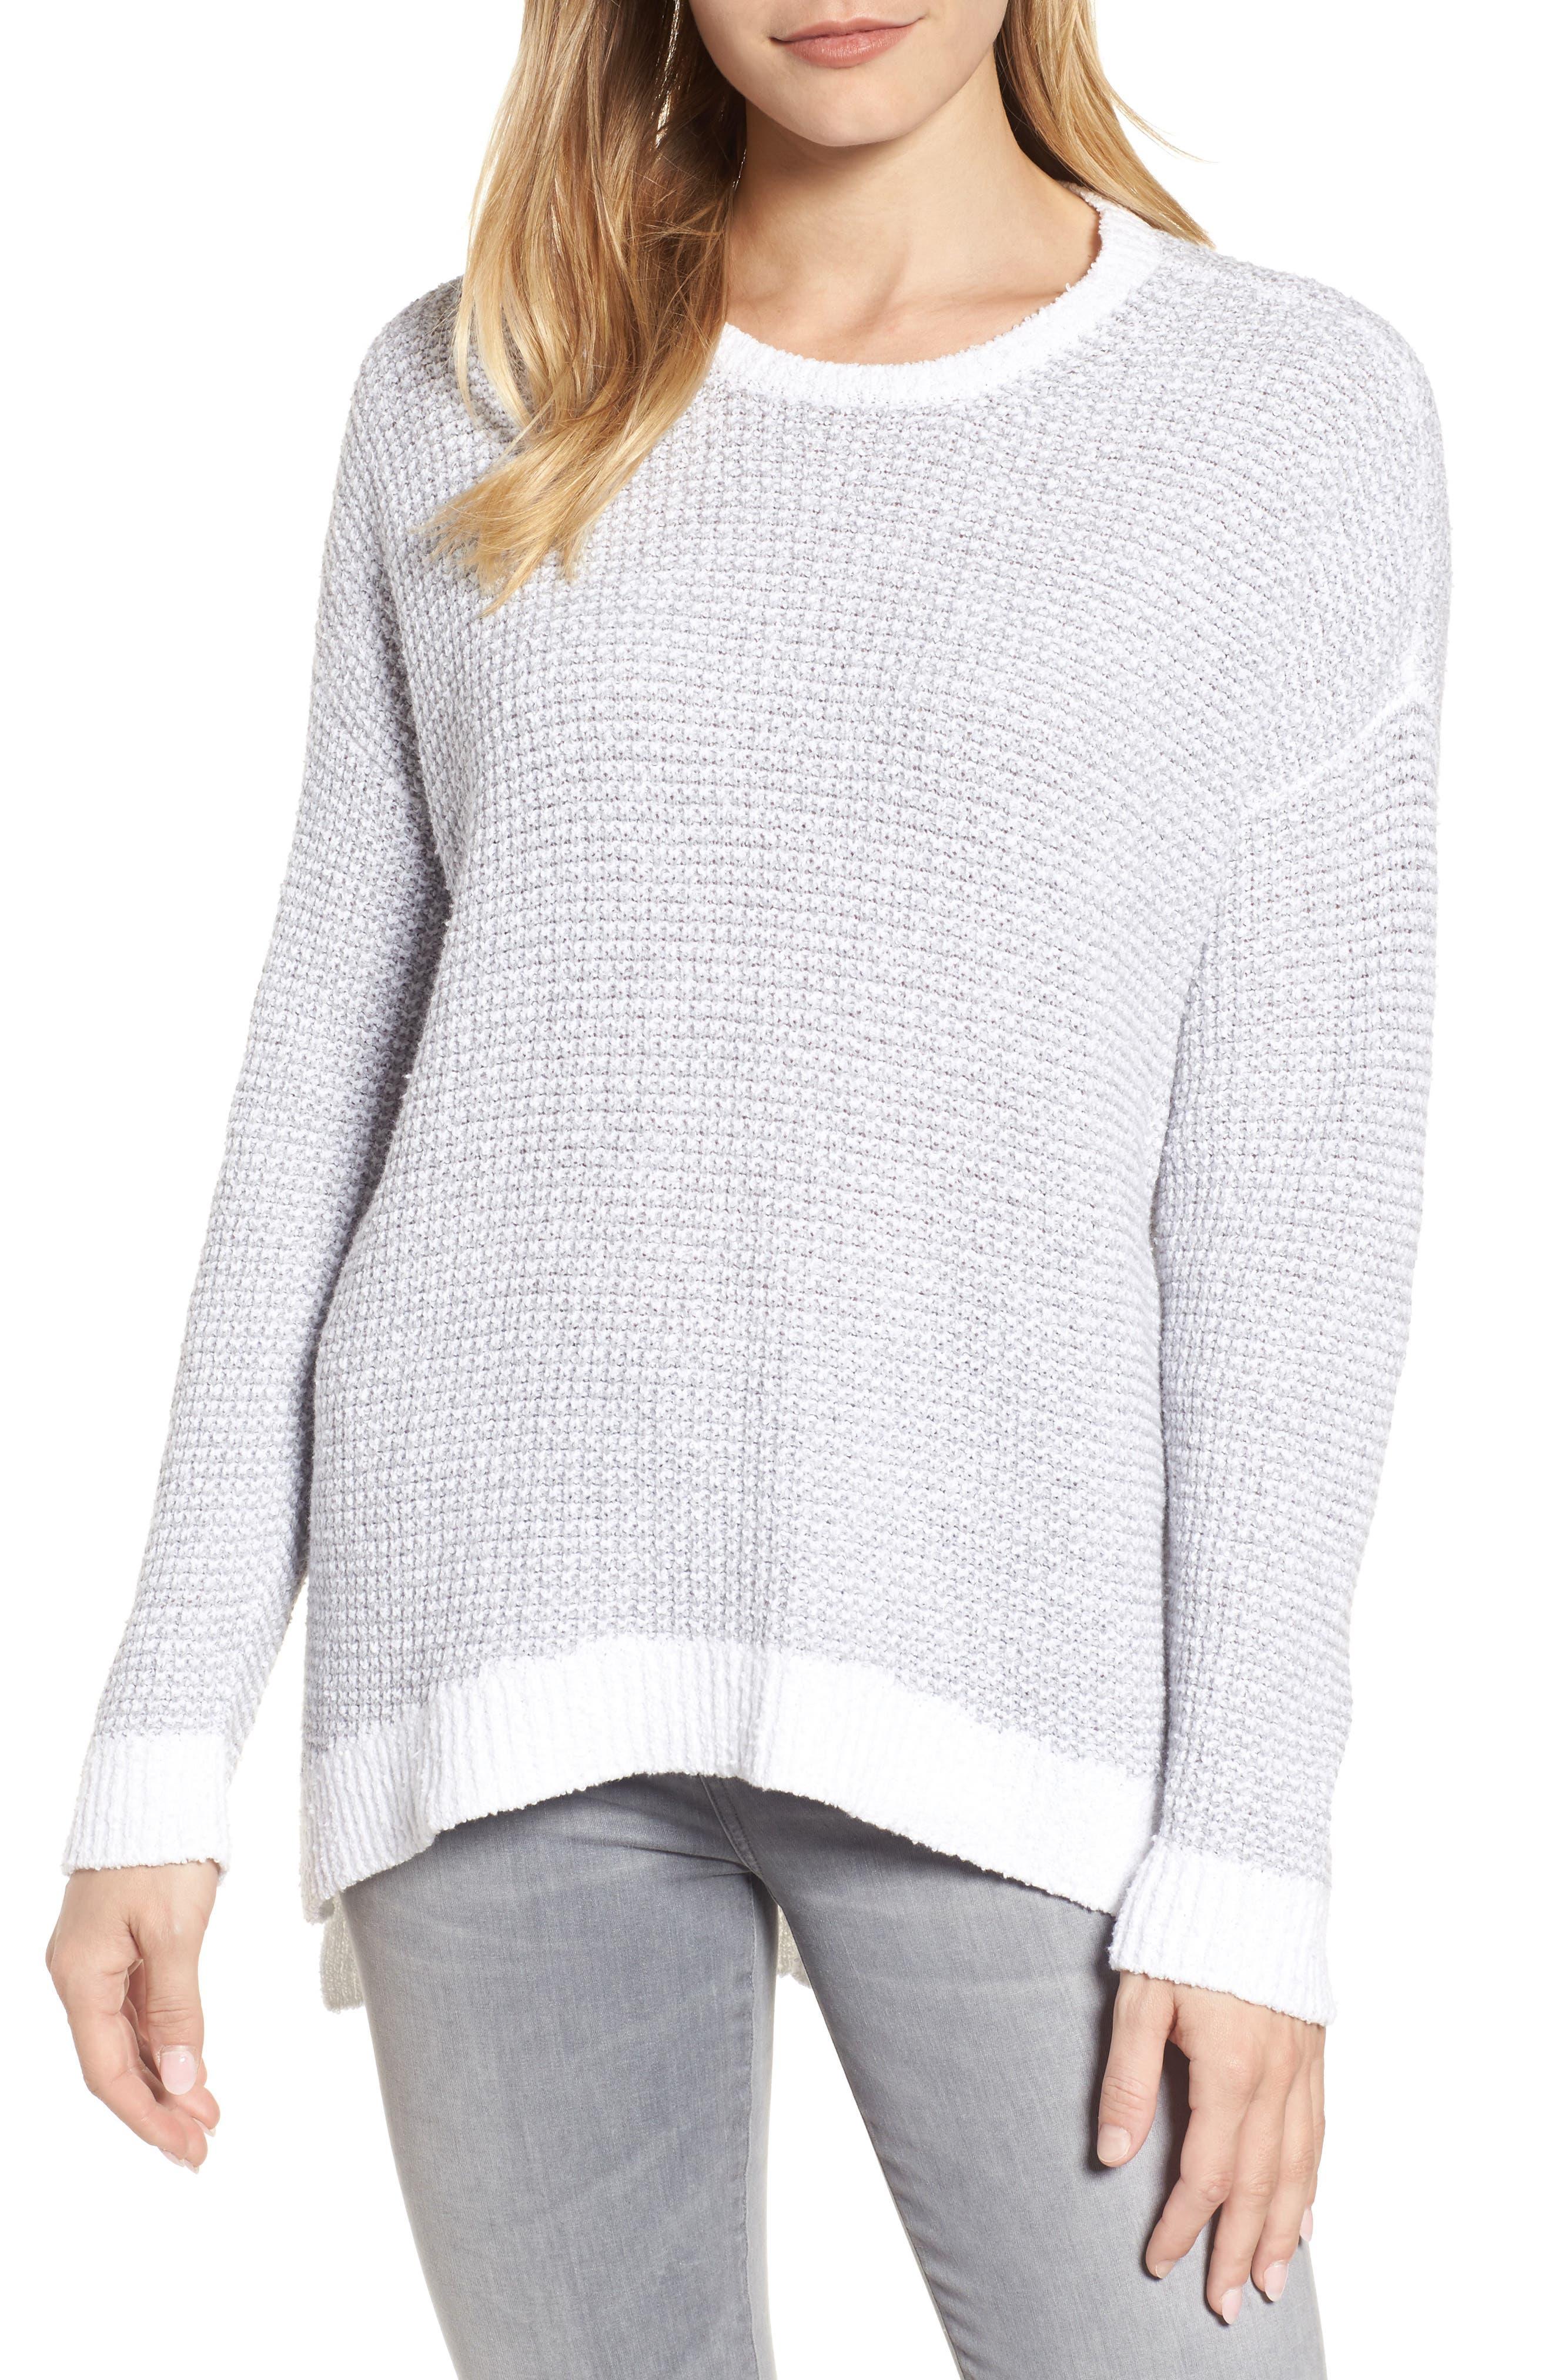 Waffled Organic Cotton Sweater,                             Main thumbnail 1, color,                             022